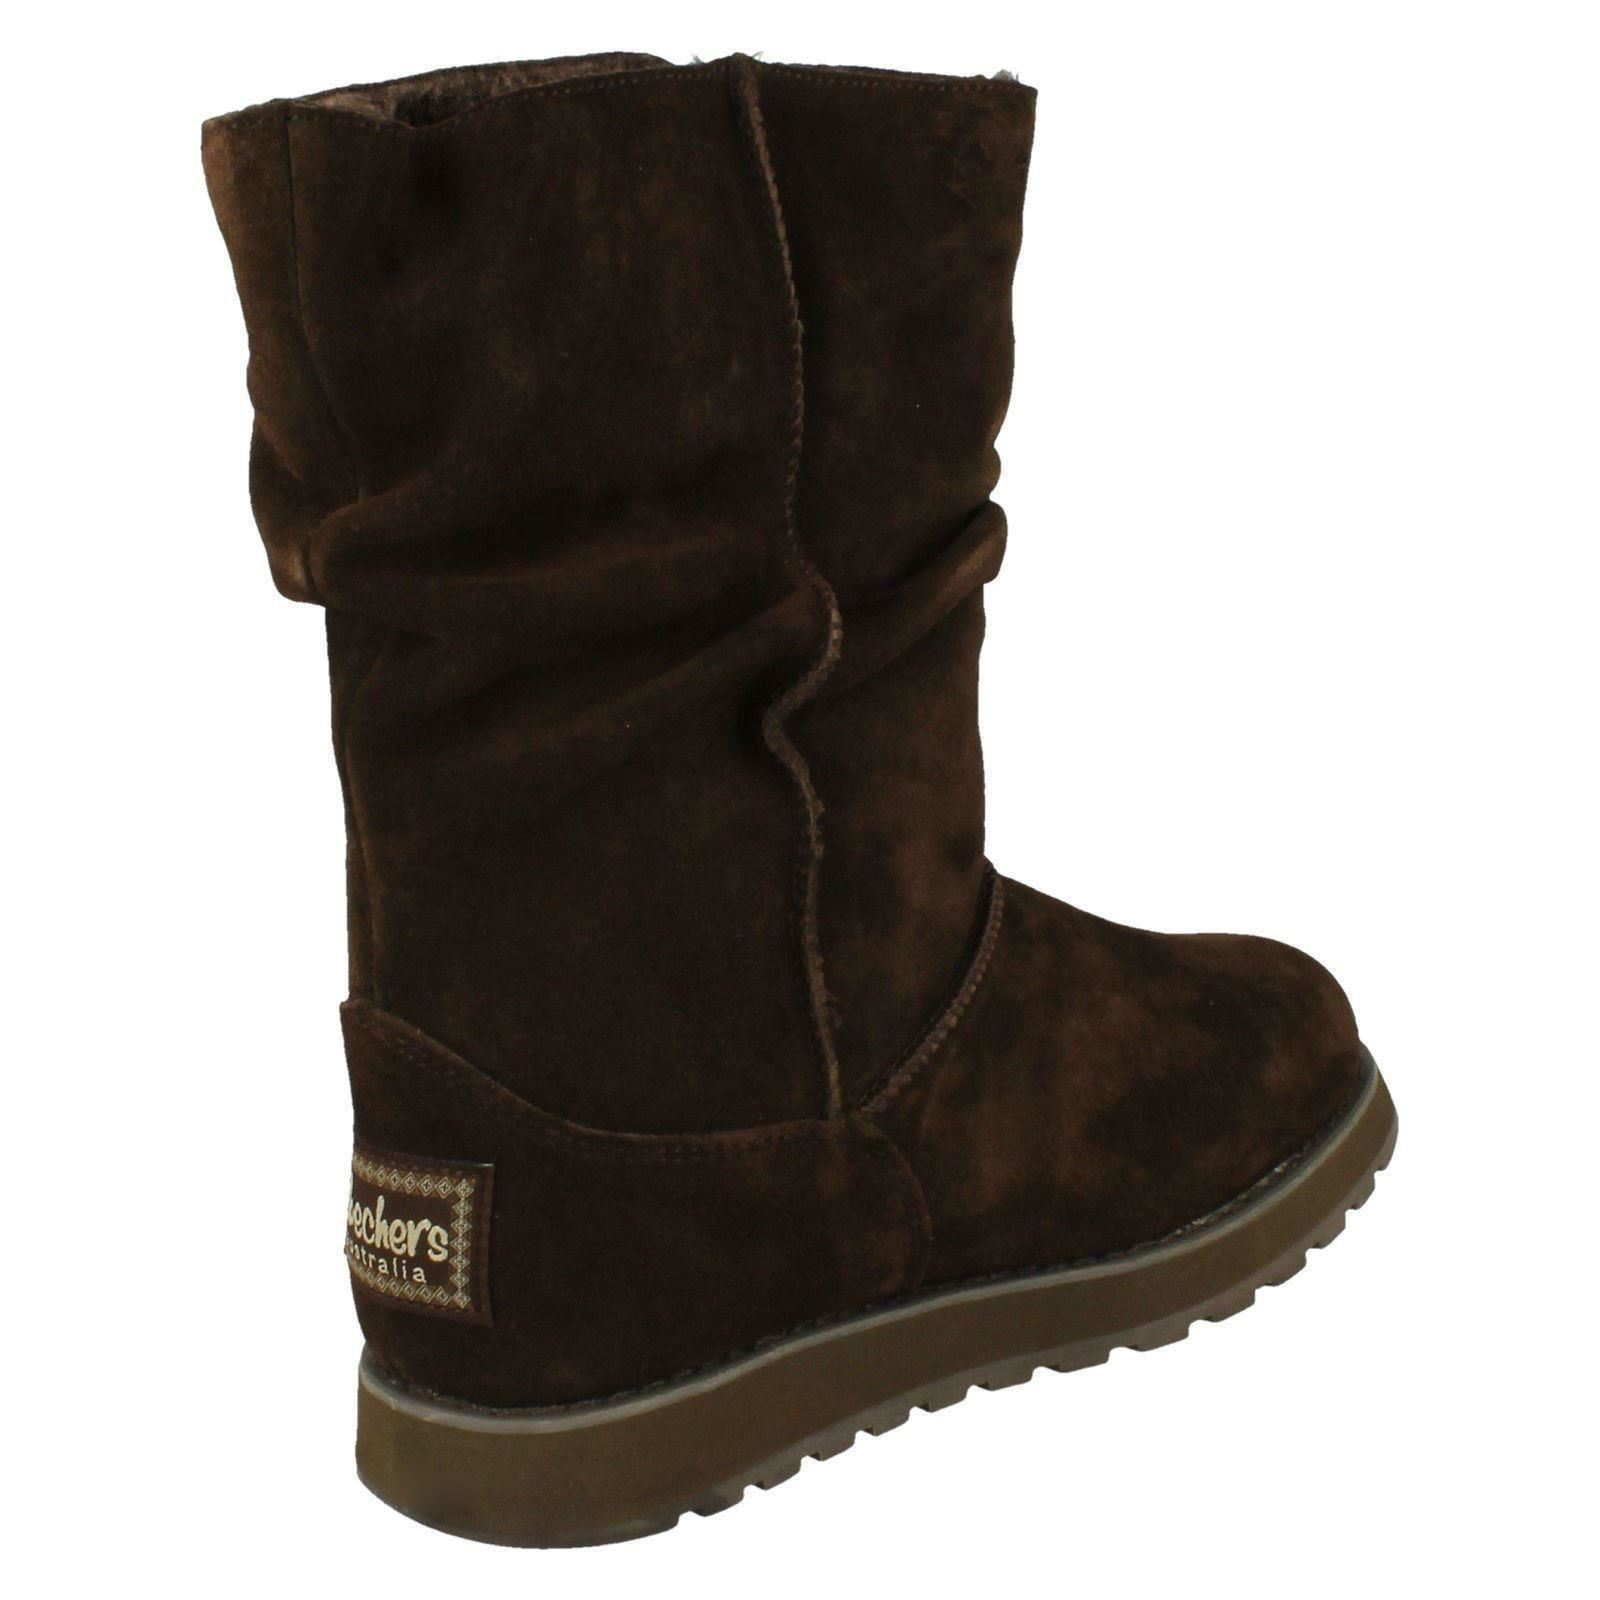 Womens Skechers Winter Boots Freezing